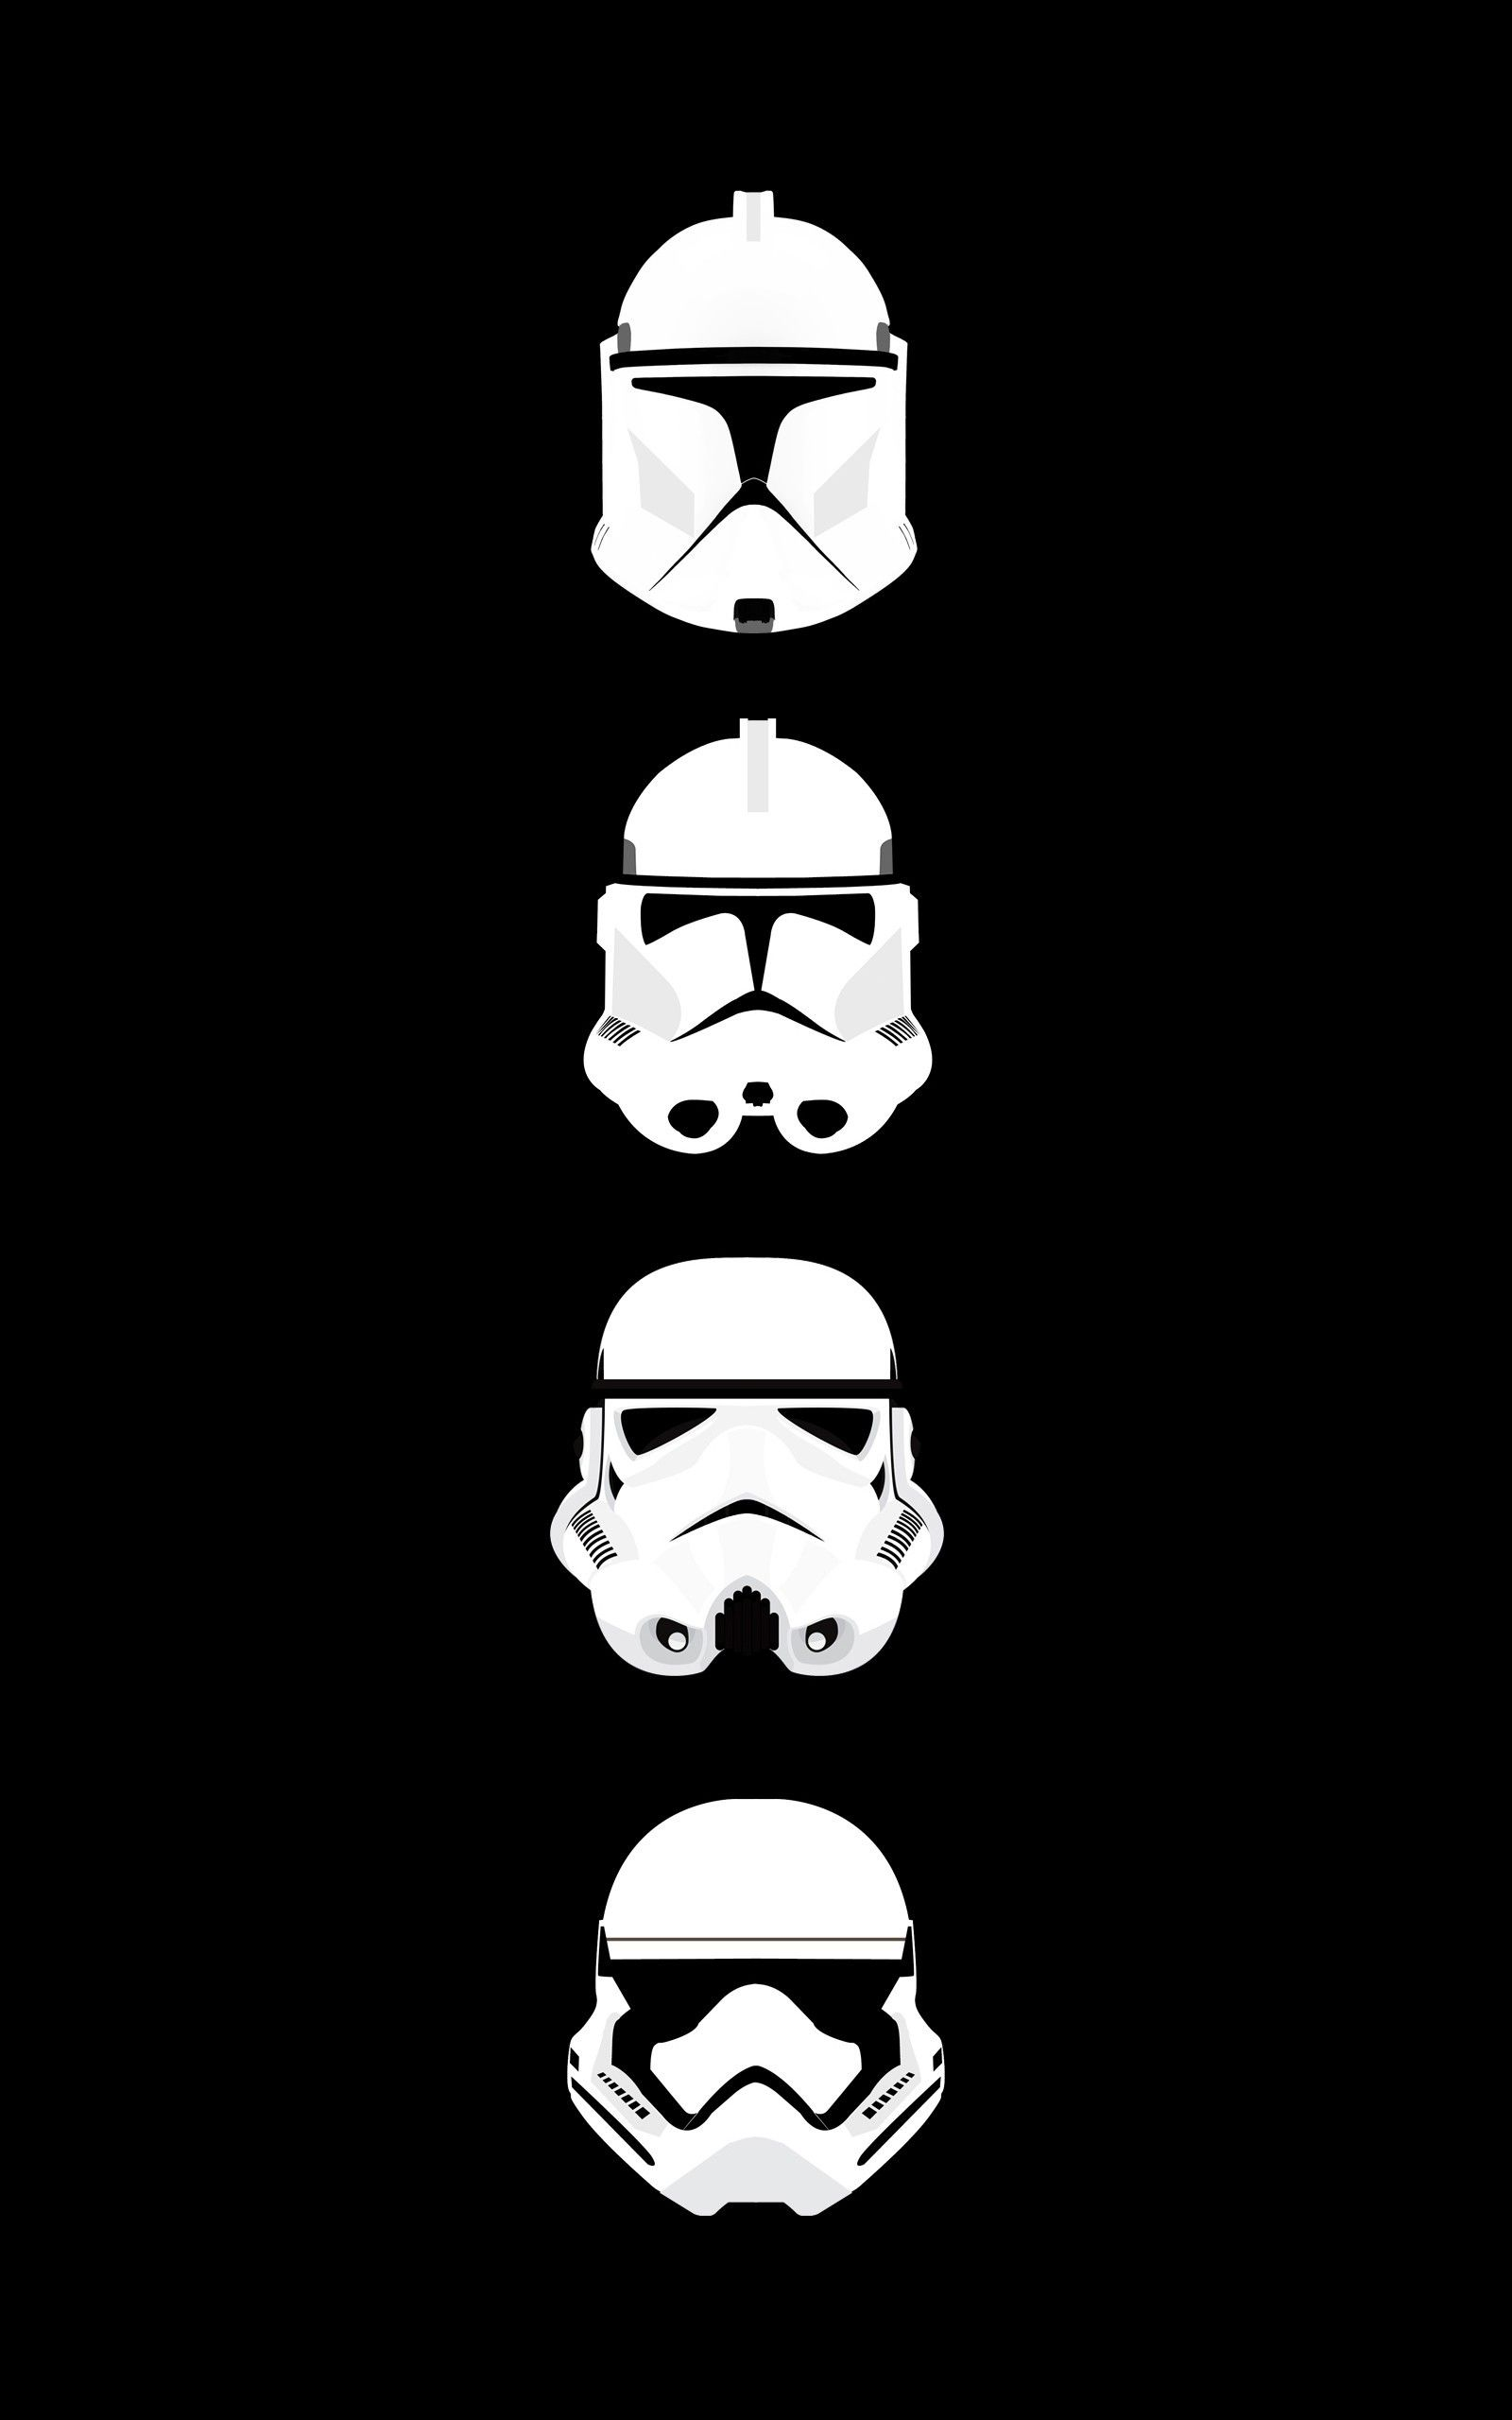 pin by solo on star wars | pinterest | star, star wars clone wars